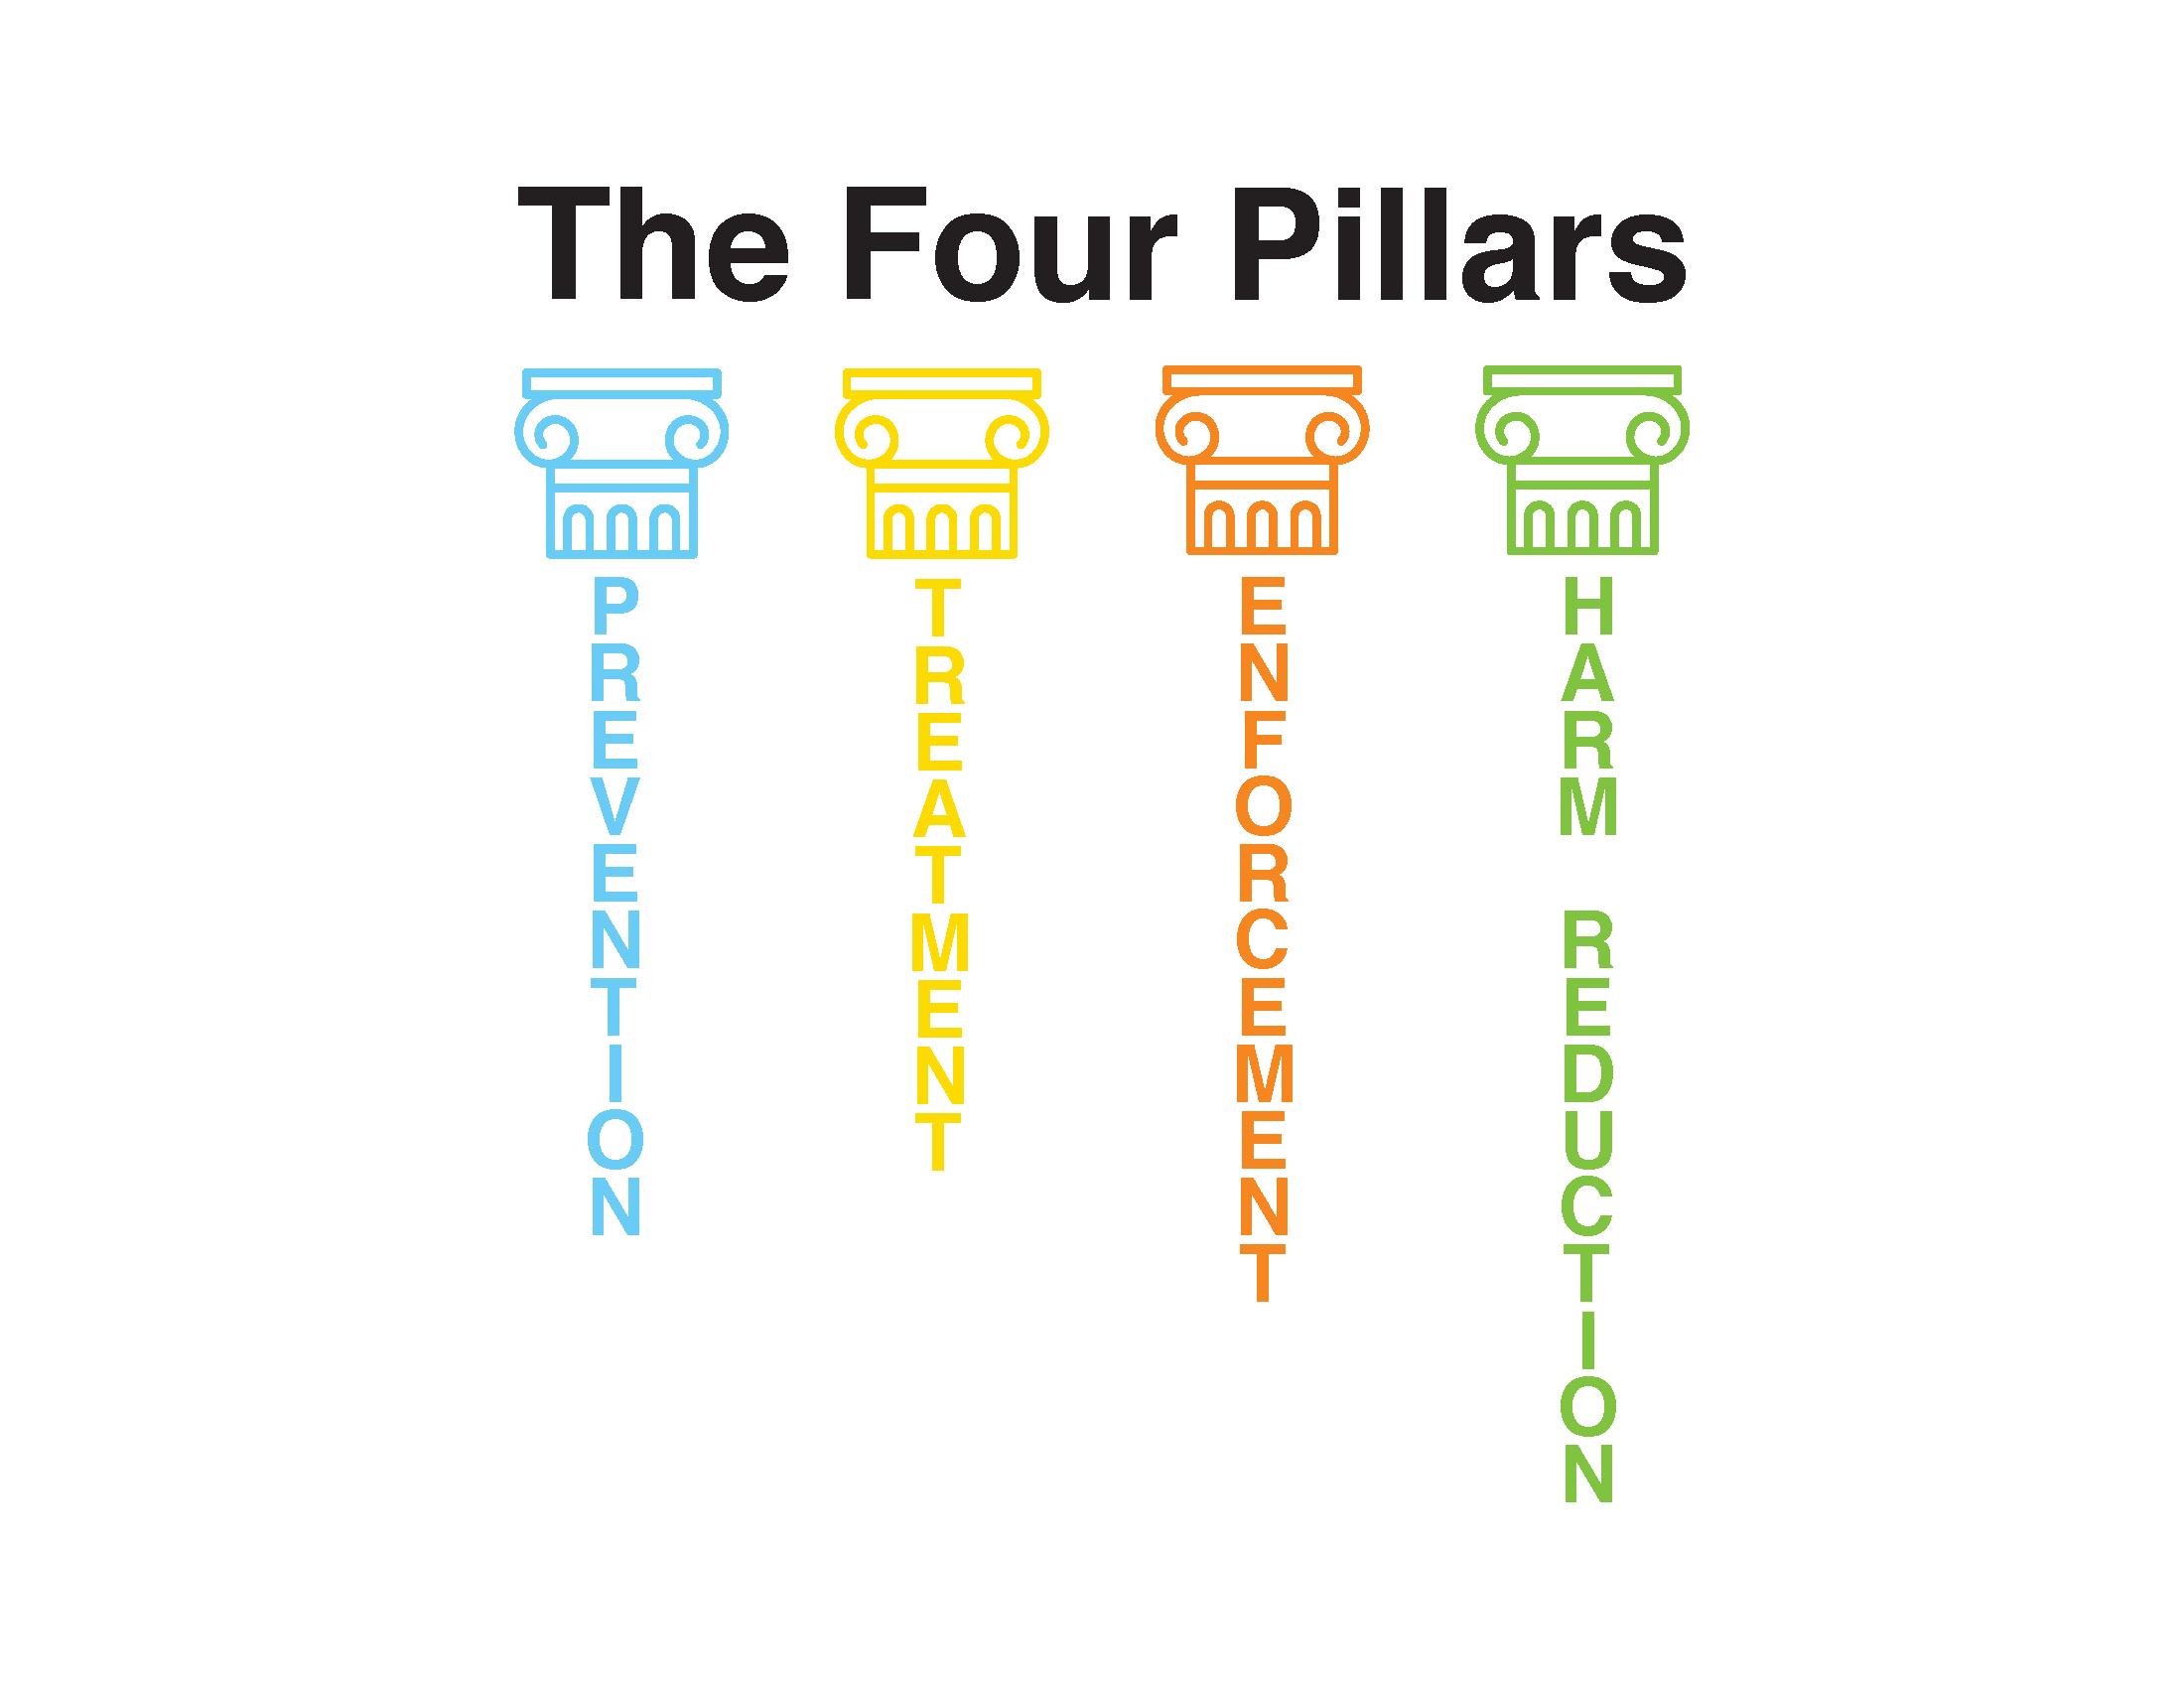 Donald MacPherson's Four Pillars. Illustration courtesy of  Rachel Hsu.